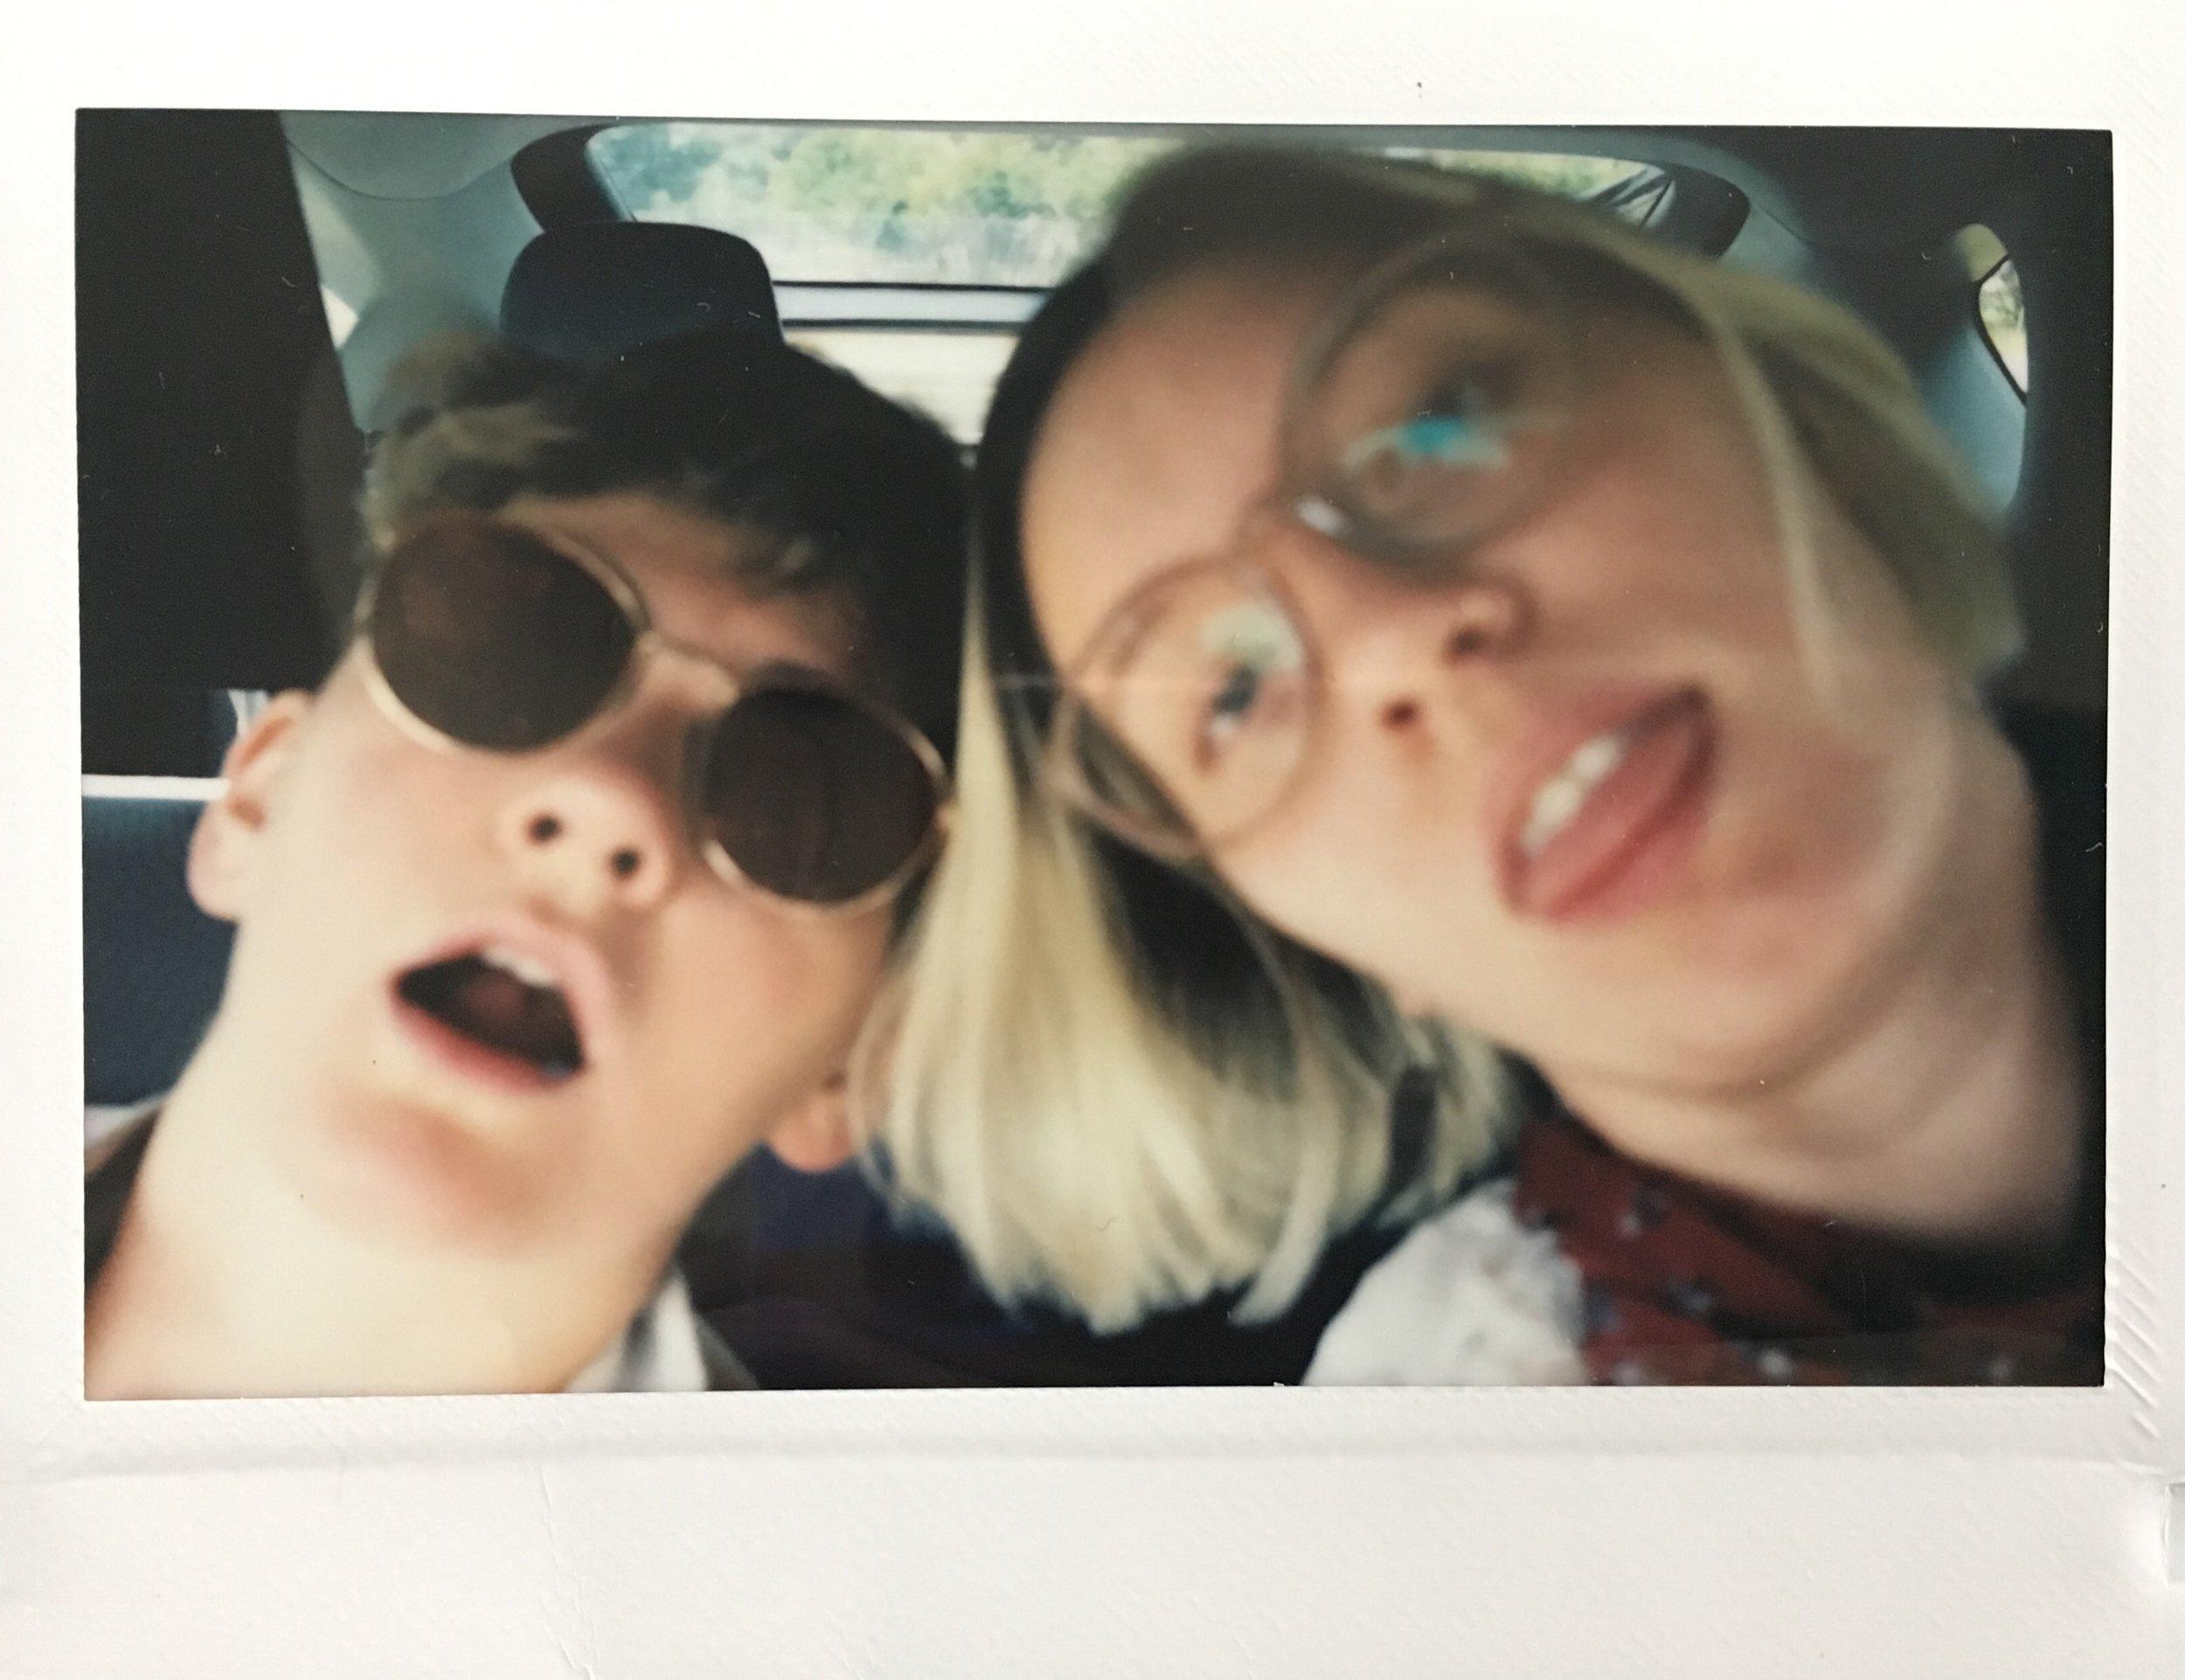 Ruby Dunphy and Haley Freedlund